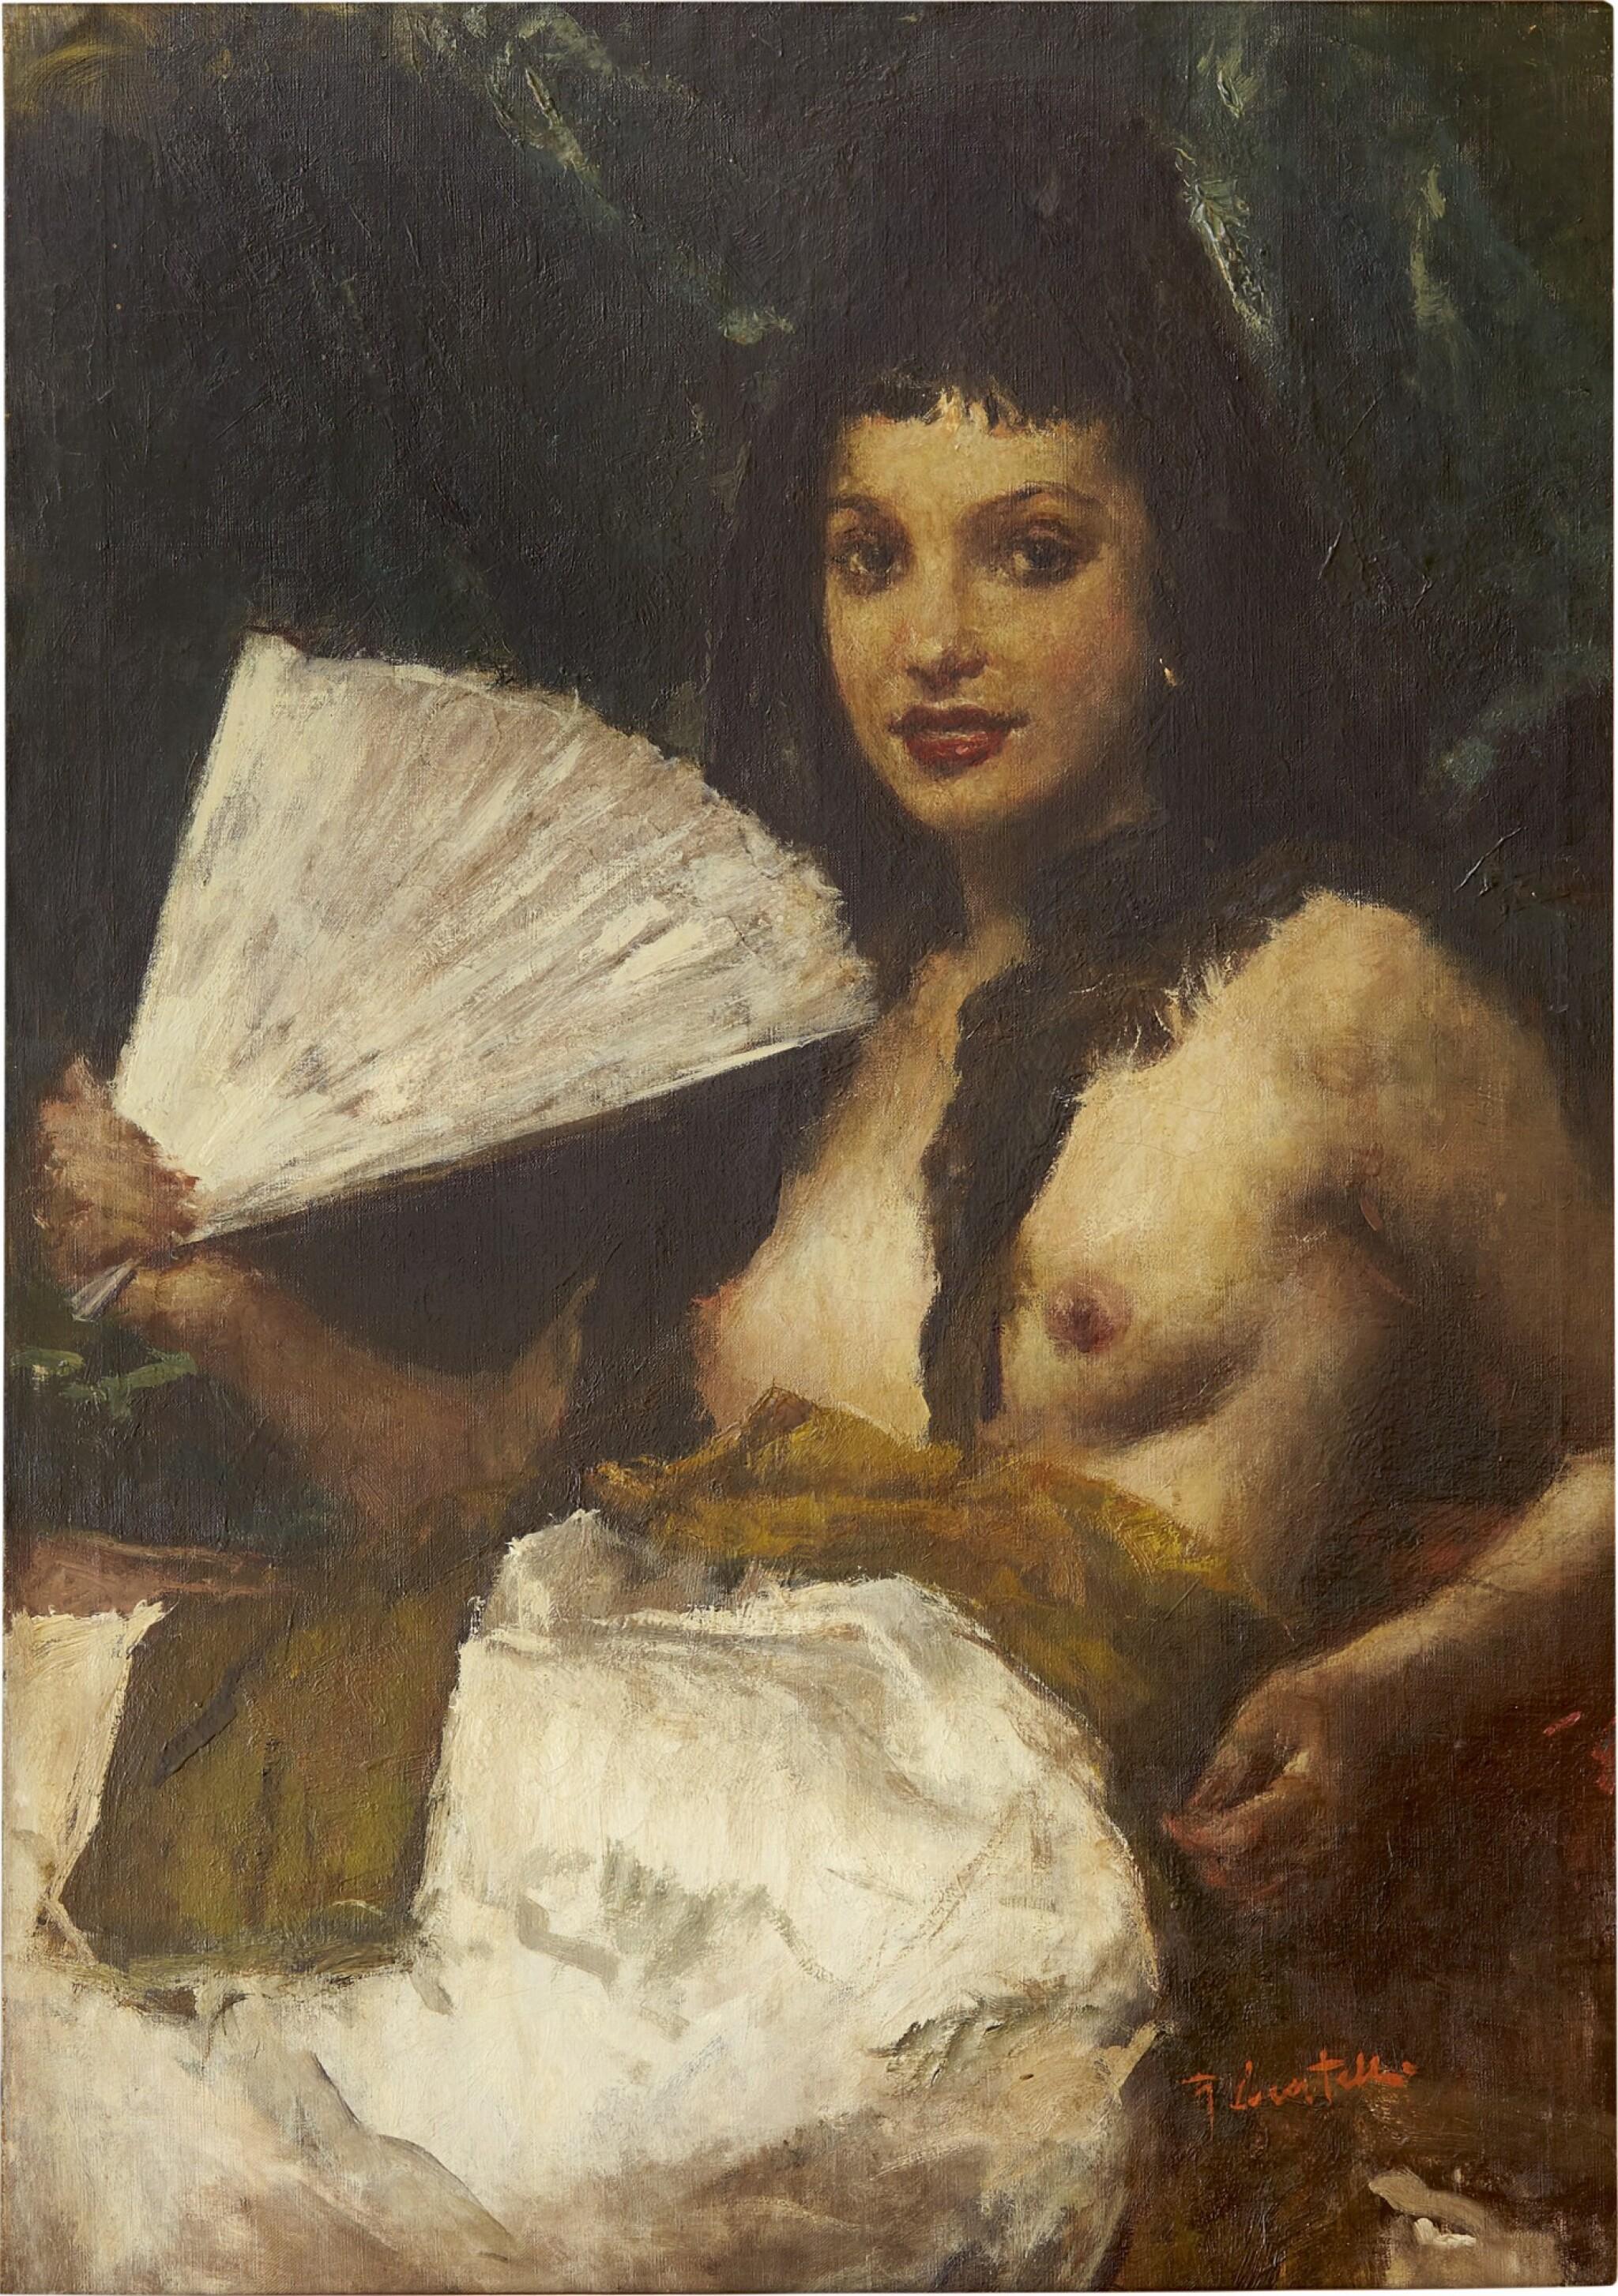 View full screen - View 1 of Lot 296. ROMUALDO FREDERICO LOCATELLI 羅莫爾多·羅格泰利  | NUDE WITH A FAN (LA MADRILEÑA/ LADY FROM MADRID) 紈扇裸體 (馬德里的女士).